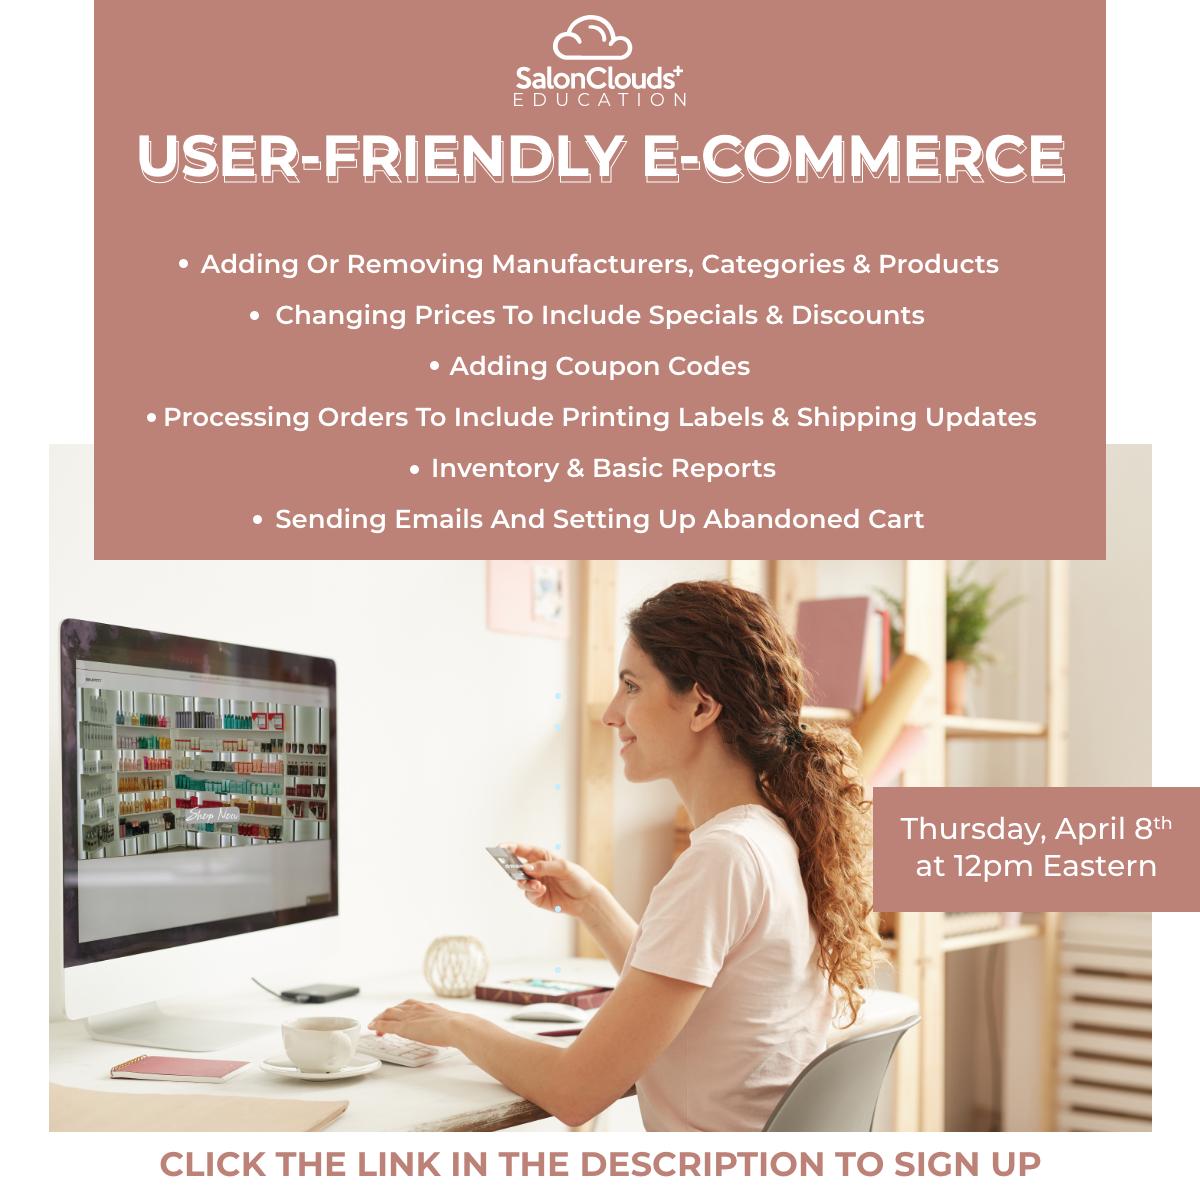 User-Friendly E-commerce Training Webinar Recording